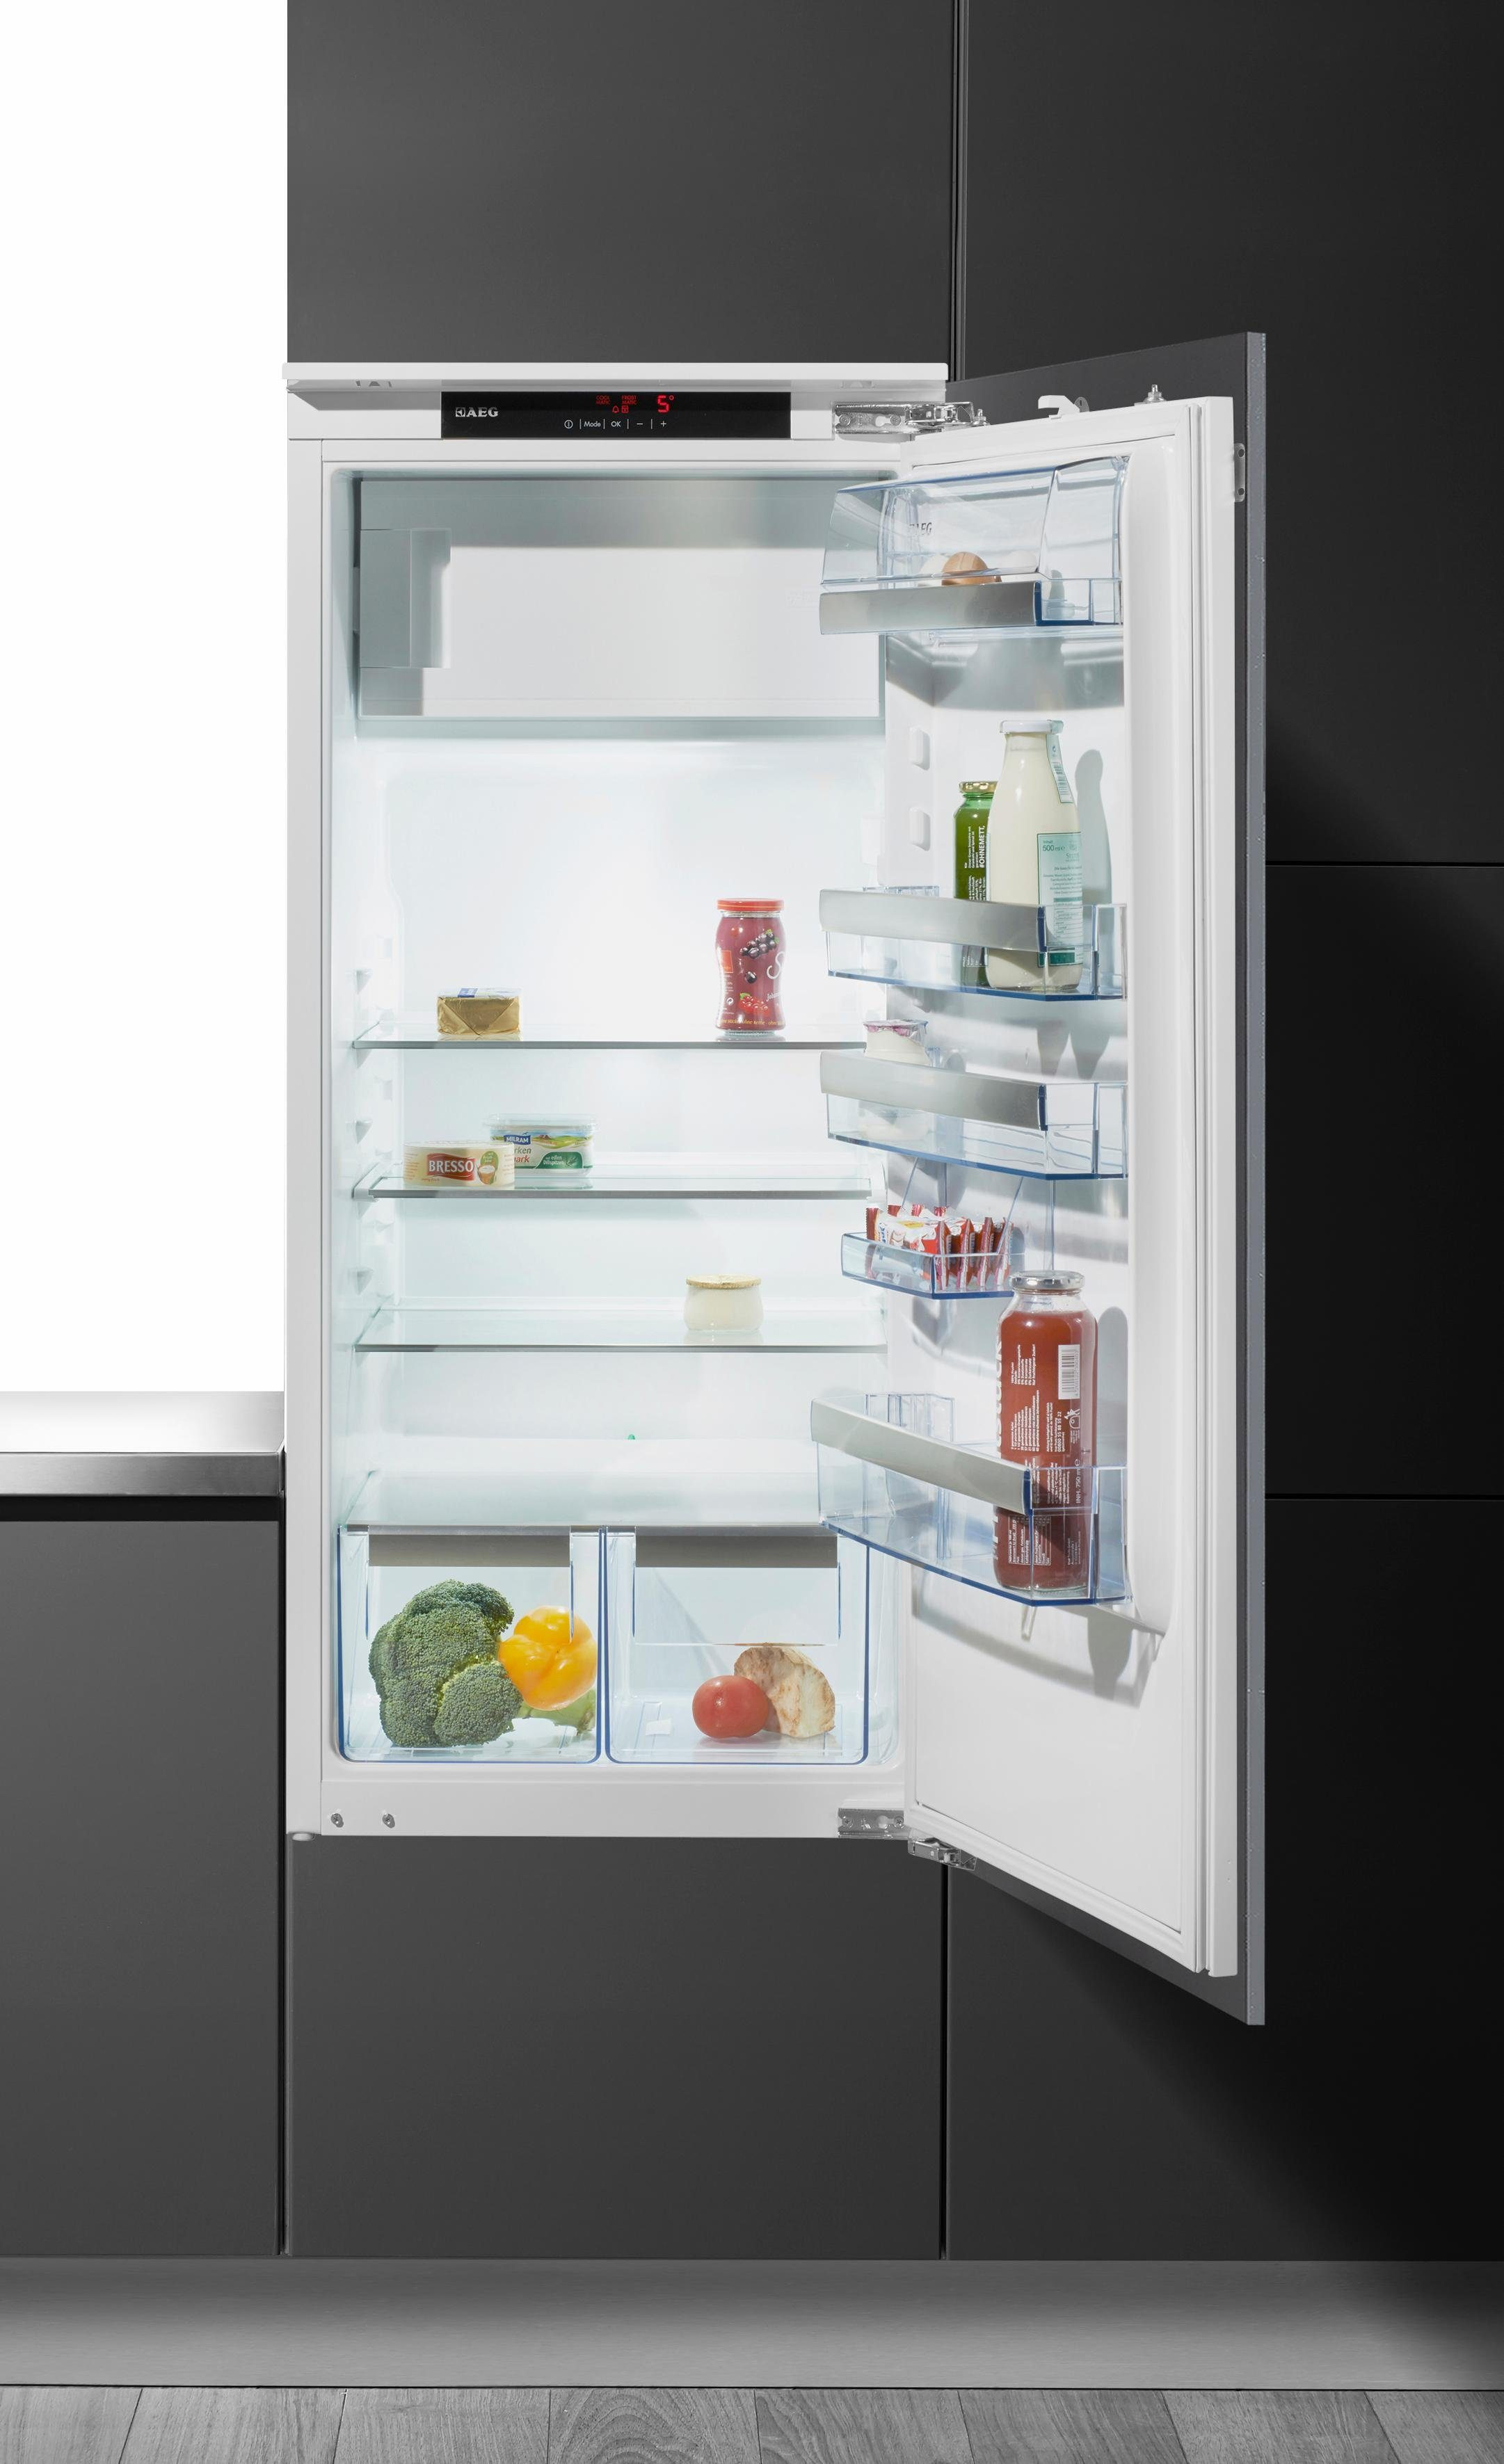 AEG integrierbarer Einbaukühlschrank SANTO SKS91240F1, A+++, 121,9 cm